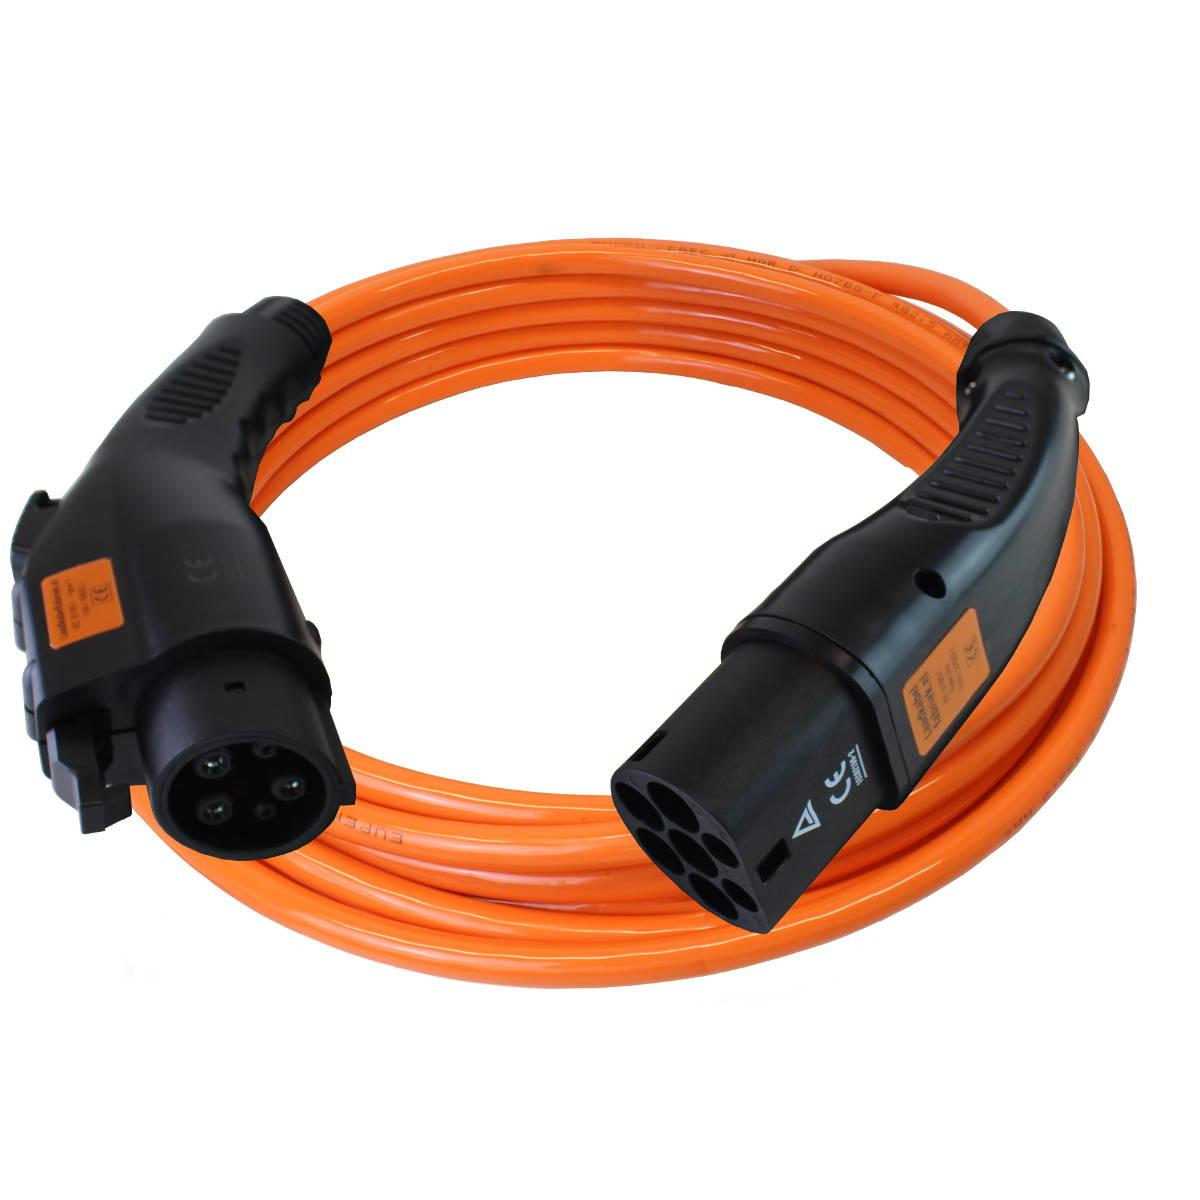 snellaadkabel type 2 naar type 1 7 4 kilowatt 32 amp re 1 fase oranje kabel zwarte. Black Bedroom Furniture Sets. Home Design Ideas